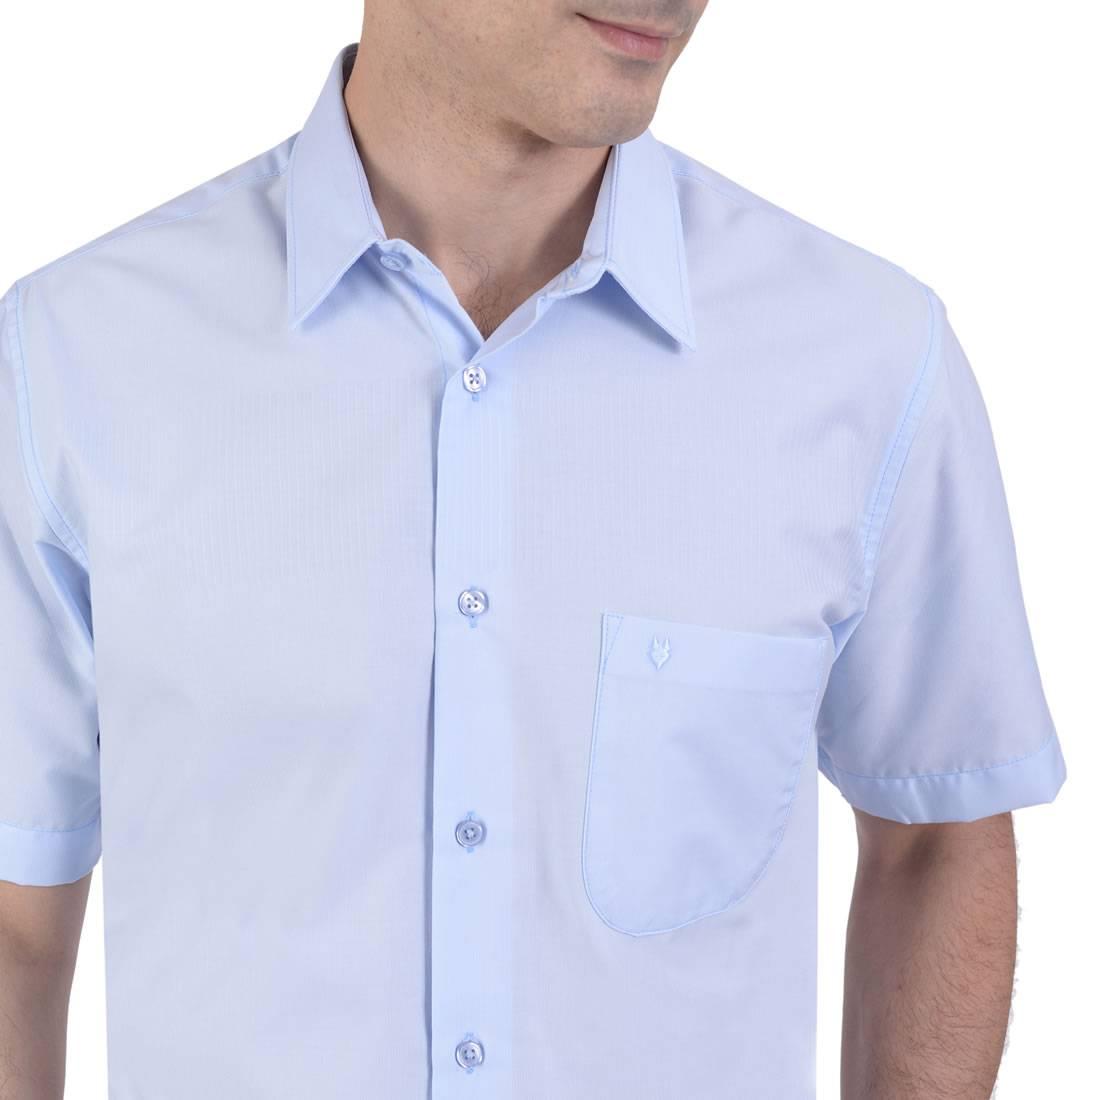 042379432110-04-Camisa-Casual-Manga-Corta-Classic-Fit-Azul-yale